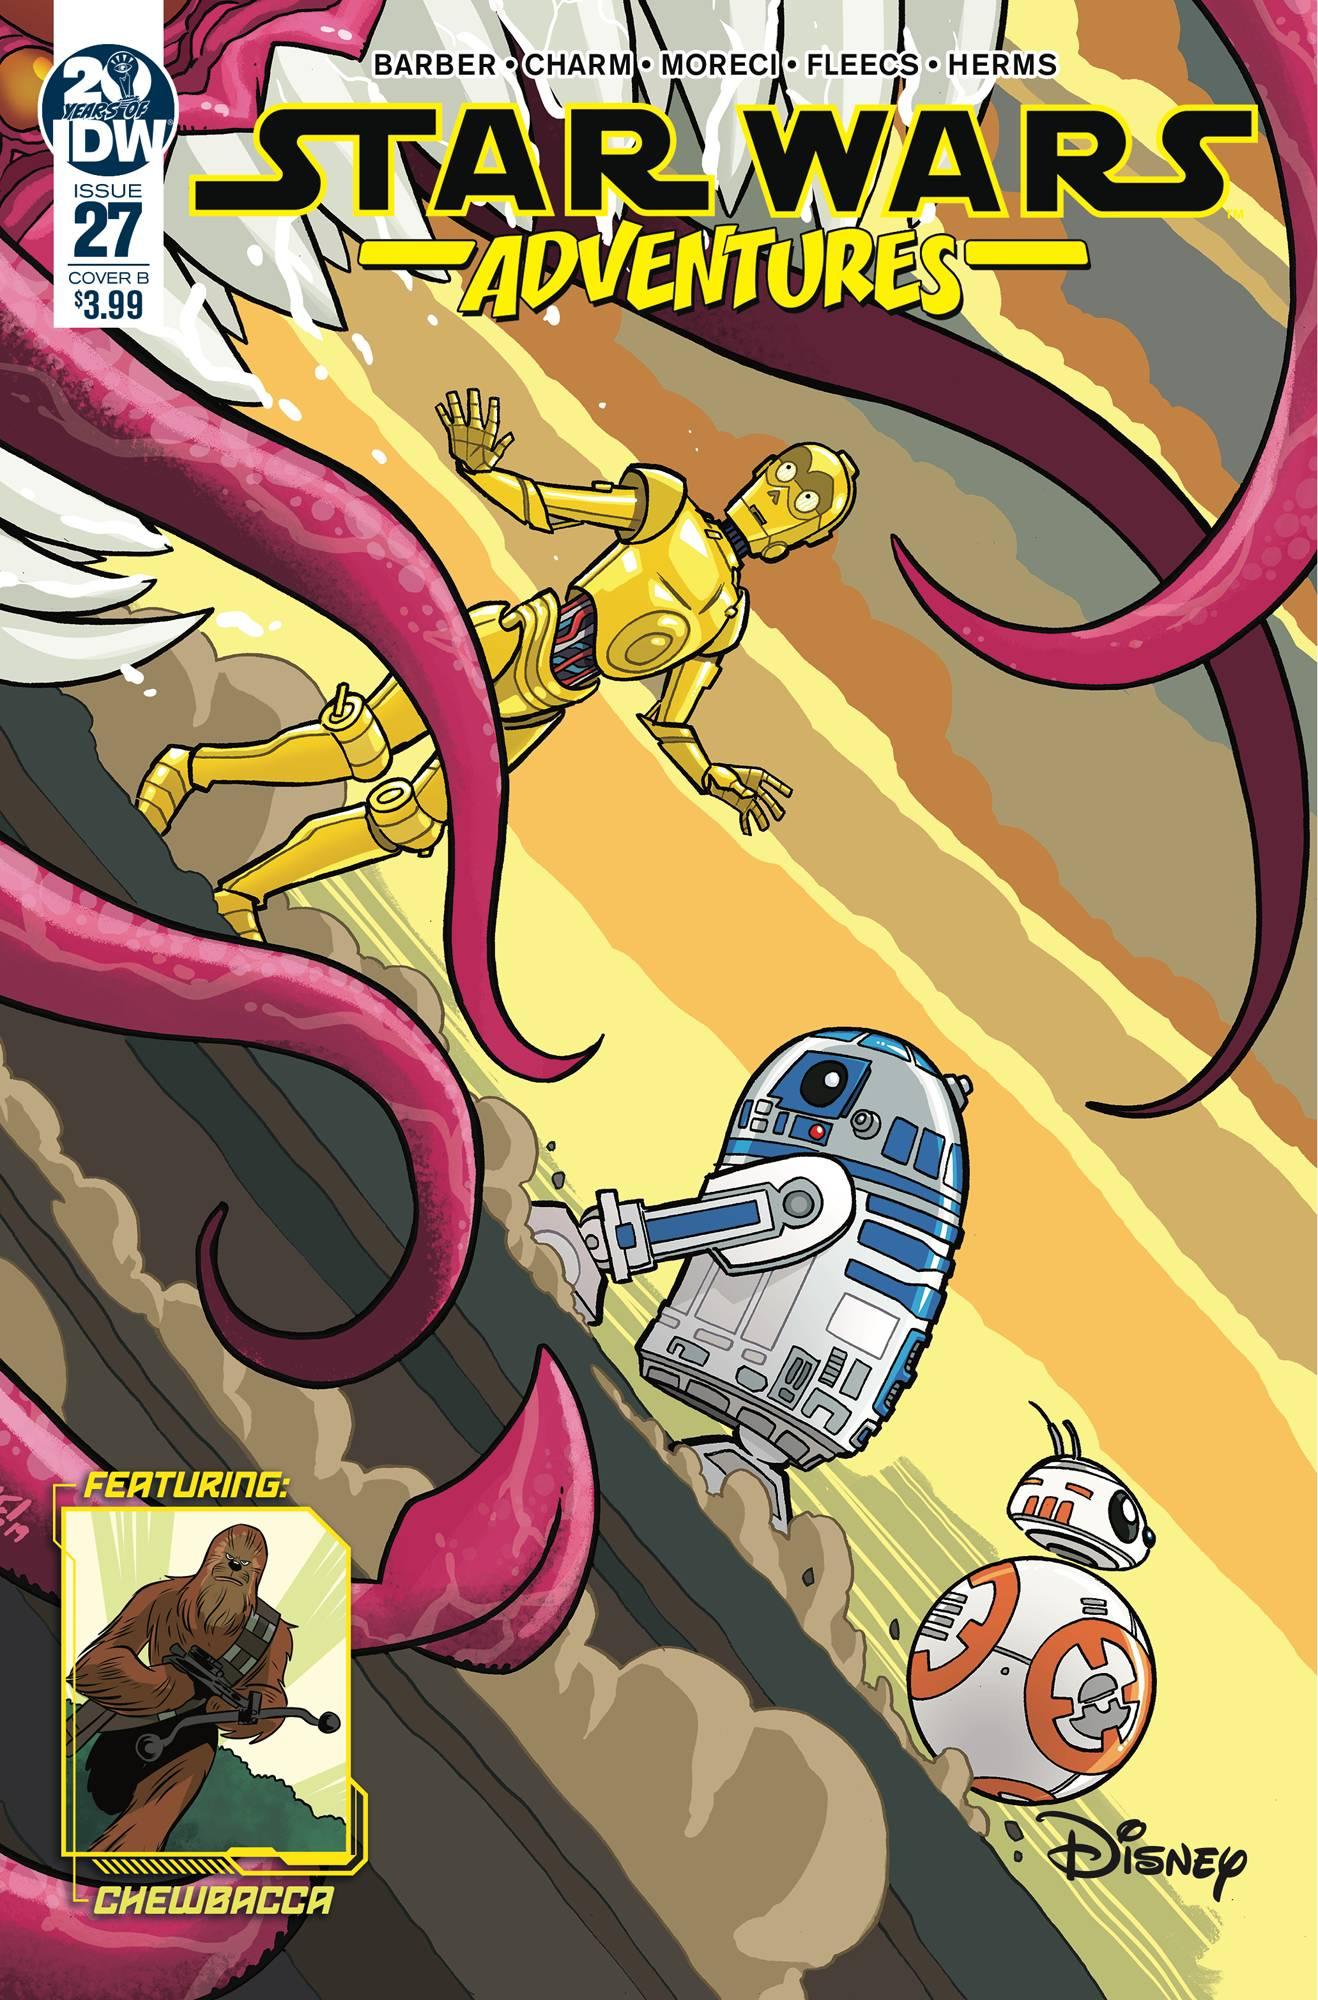 Star Wars Adventures #27 (2019)